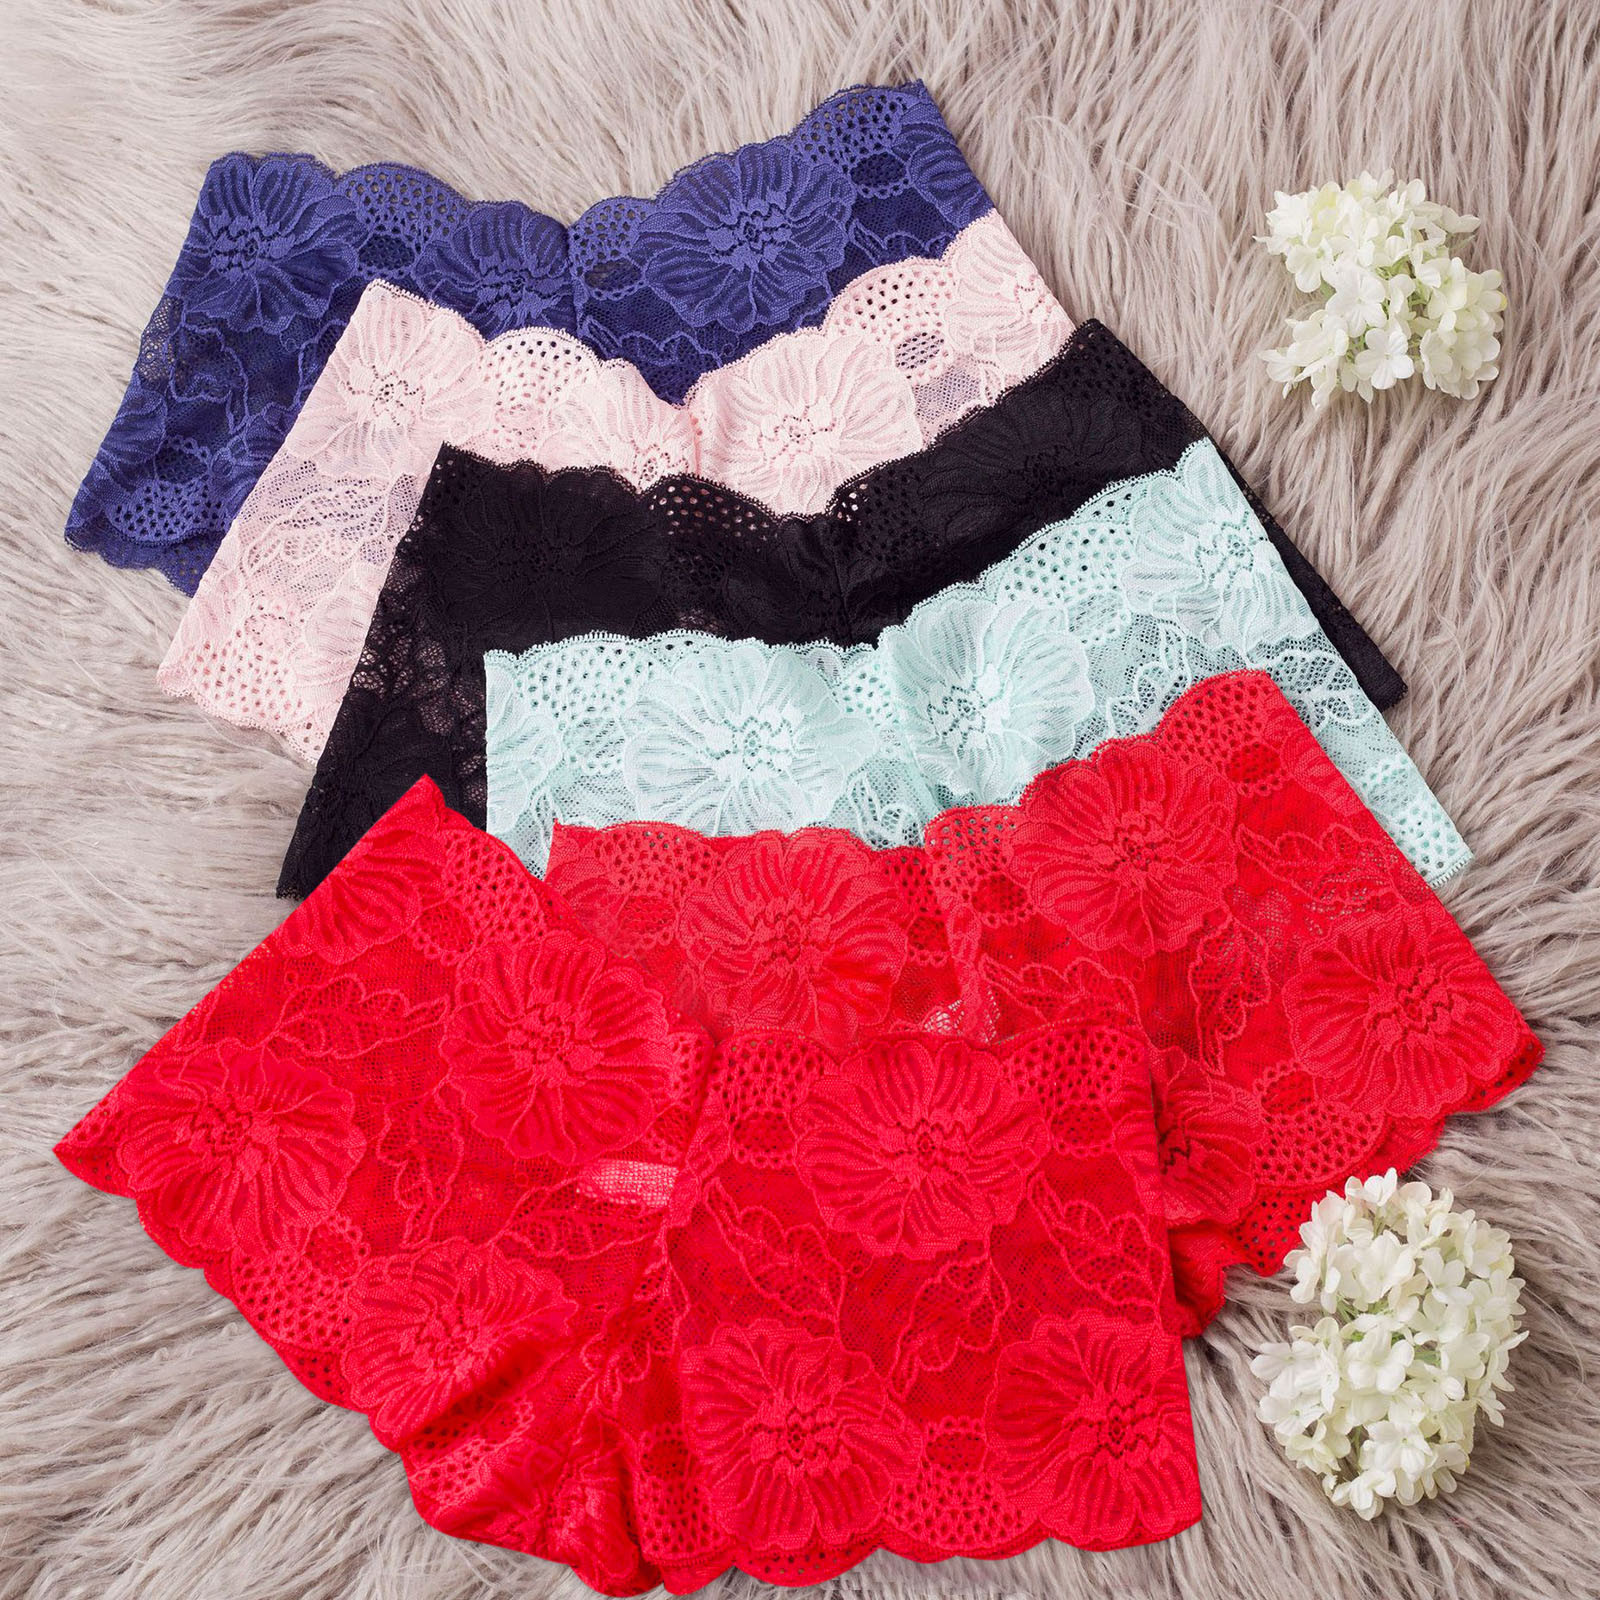 New Fashion Sexy Lingerie Lace Brief Underpant Sleepwear Underwear S-XL